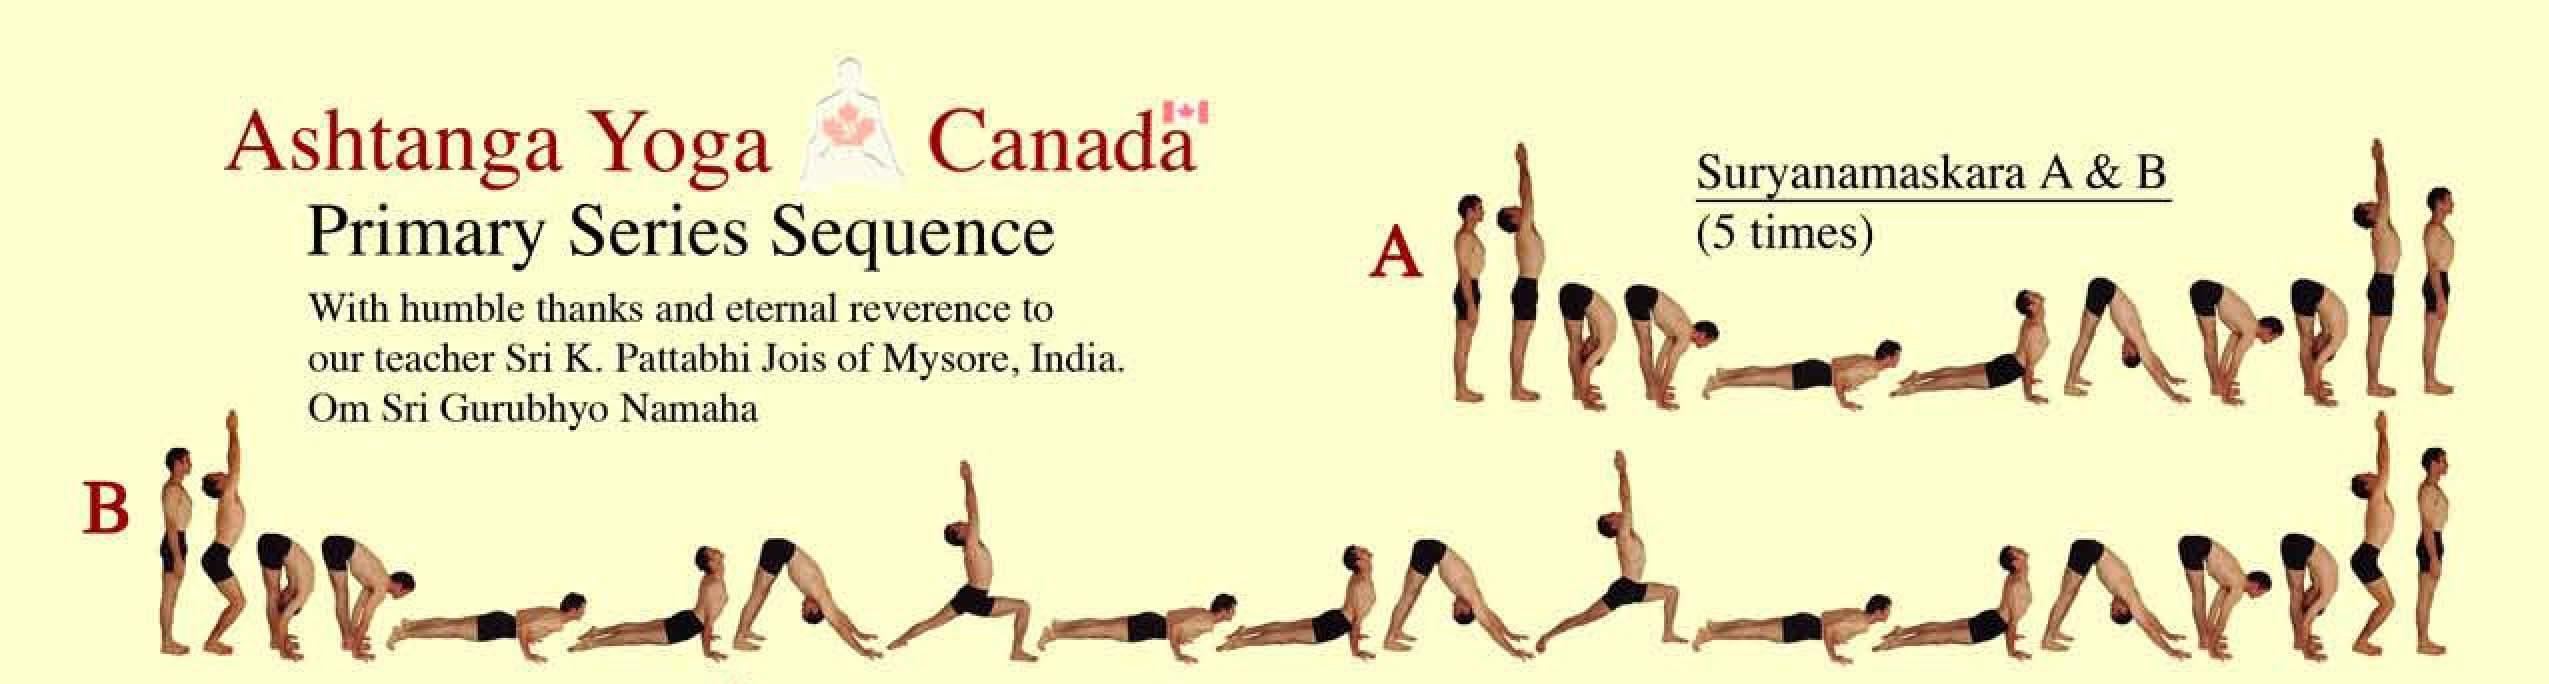 Ashtanga Yoga Primary Series Sequence